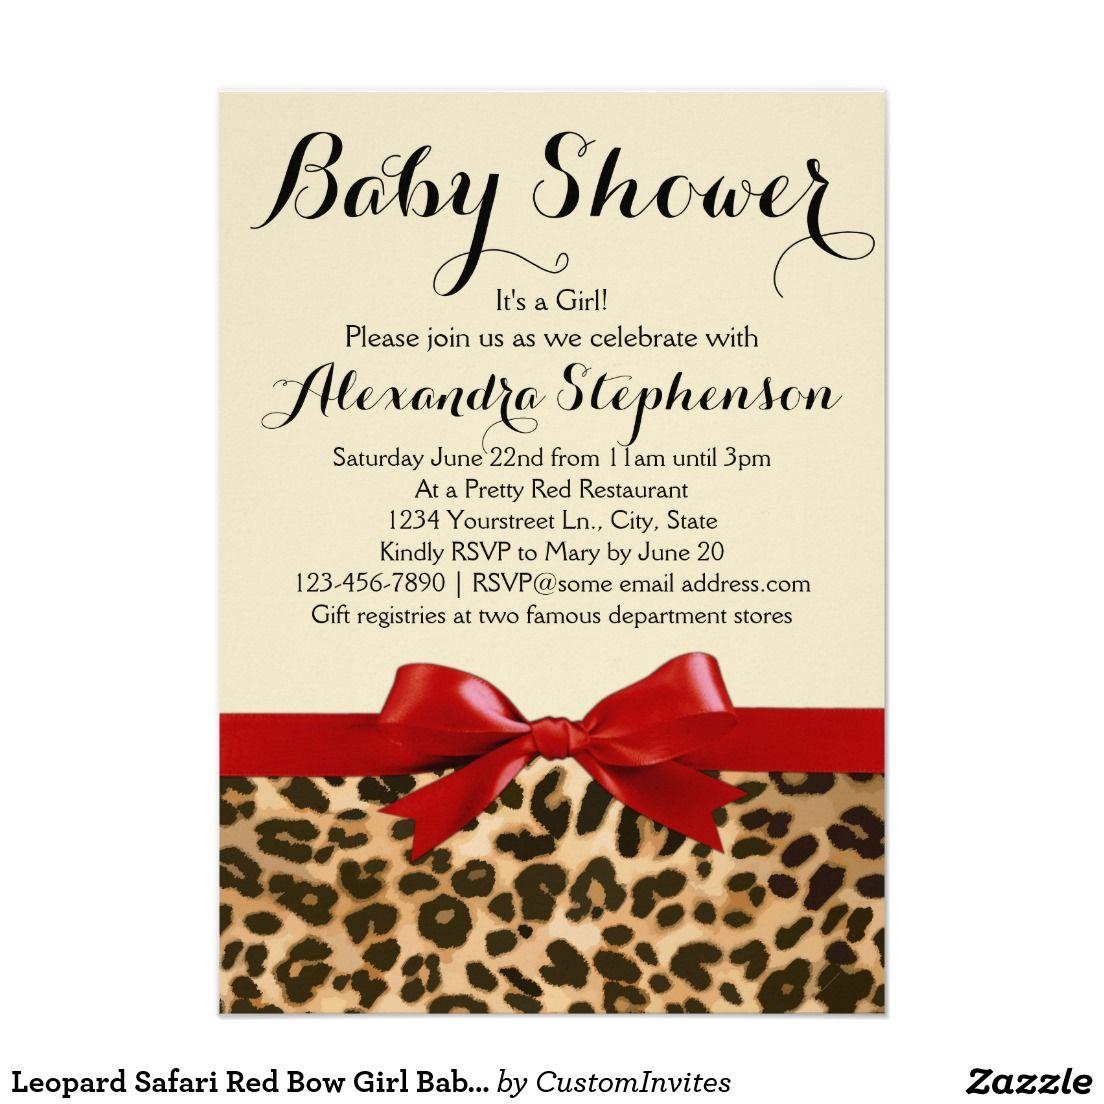 Leopard Safari Red Bow Girl Baby Shower Invitation | Baby Shower ...